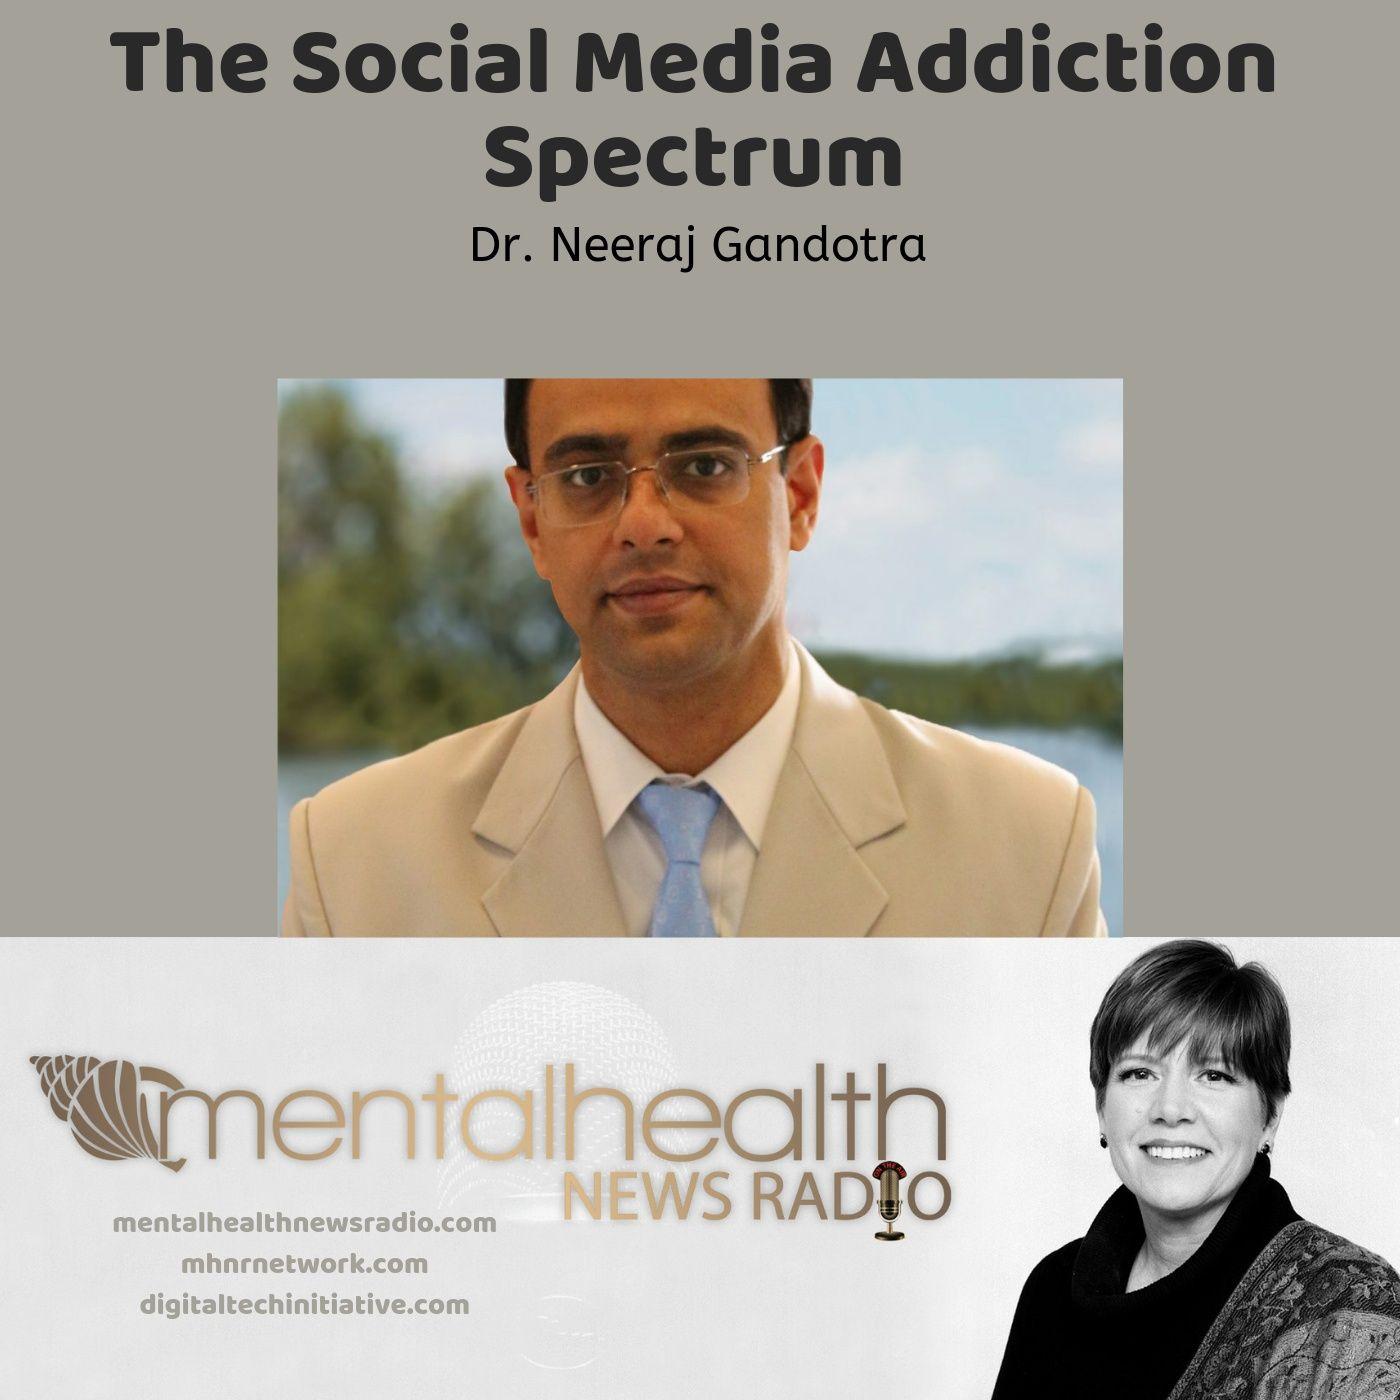 Mental Health News Radio - The Social Media Addiction Spectrum